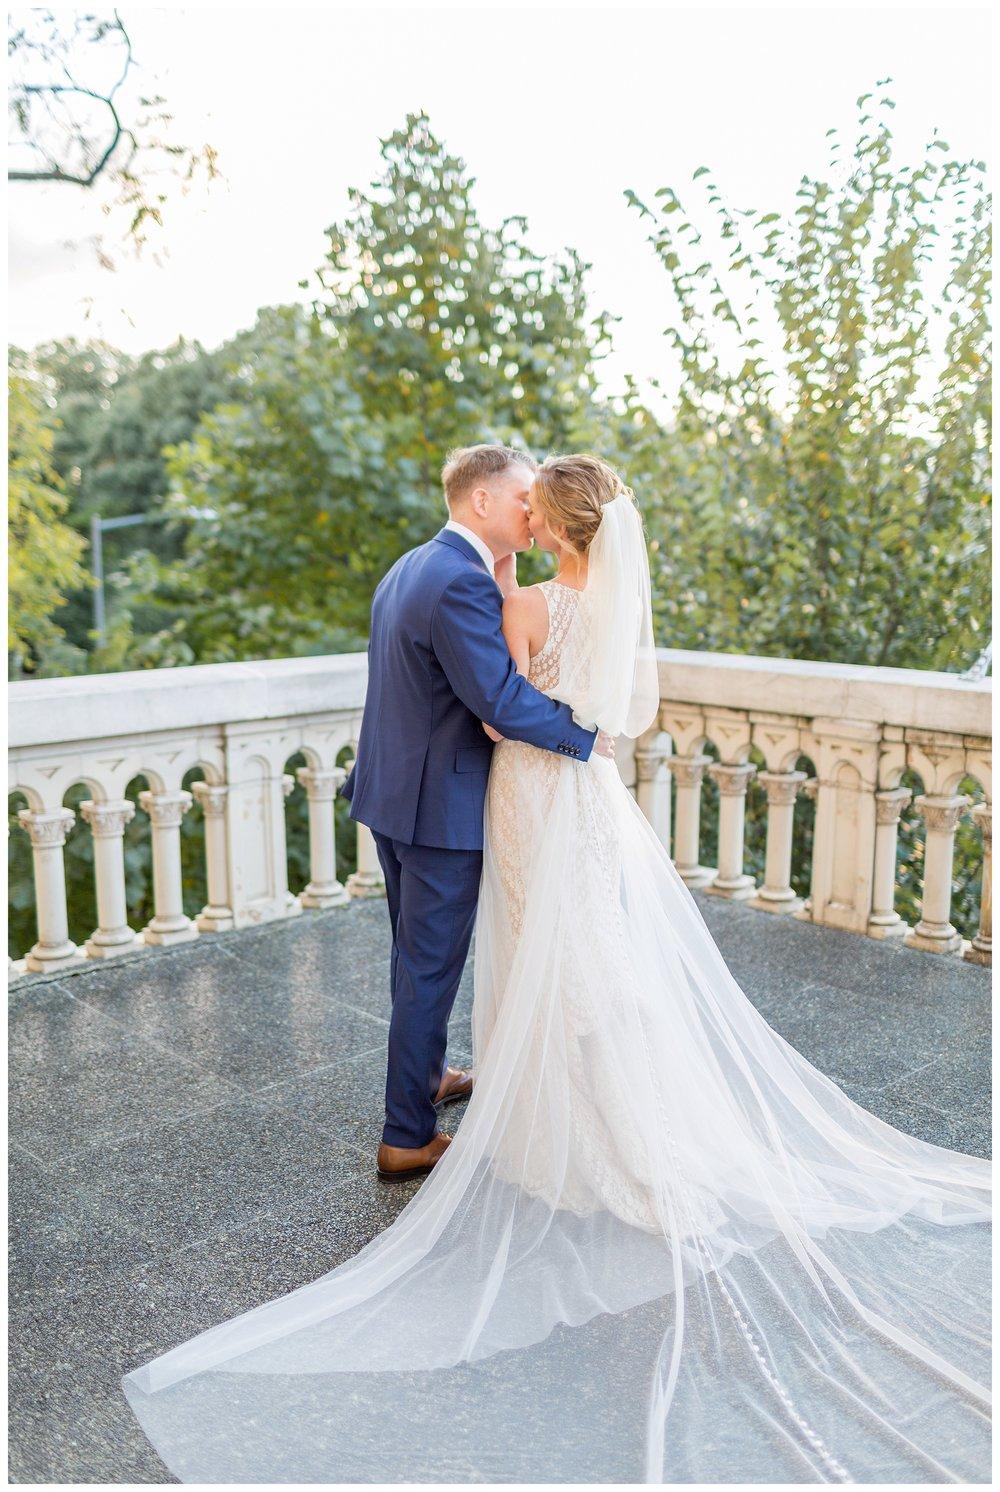 Meridian Hill Park Wedding | Washington DC Wedding Photographer Kir Tuben_0089.jpg